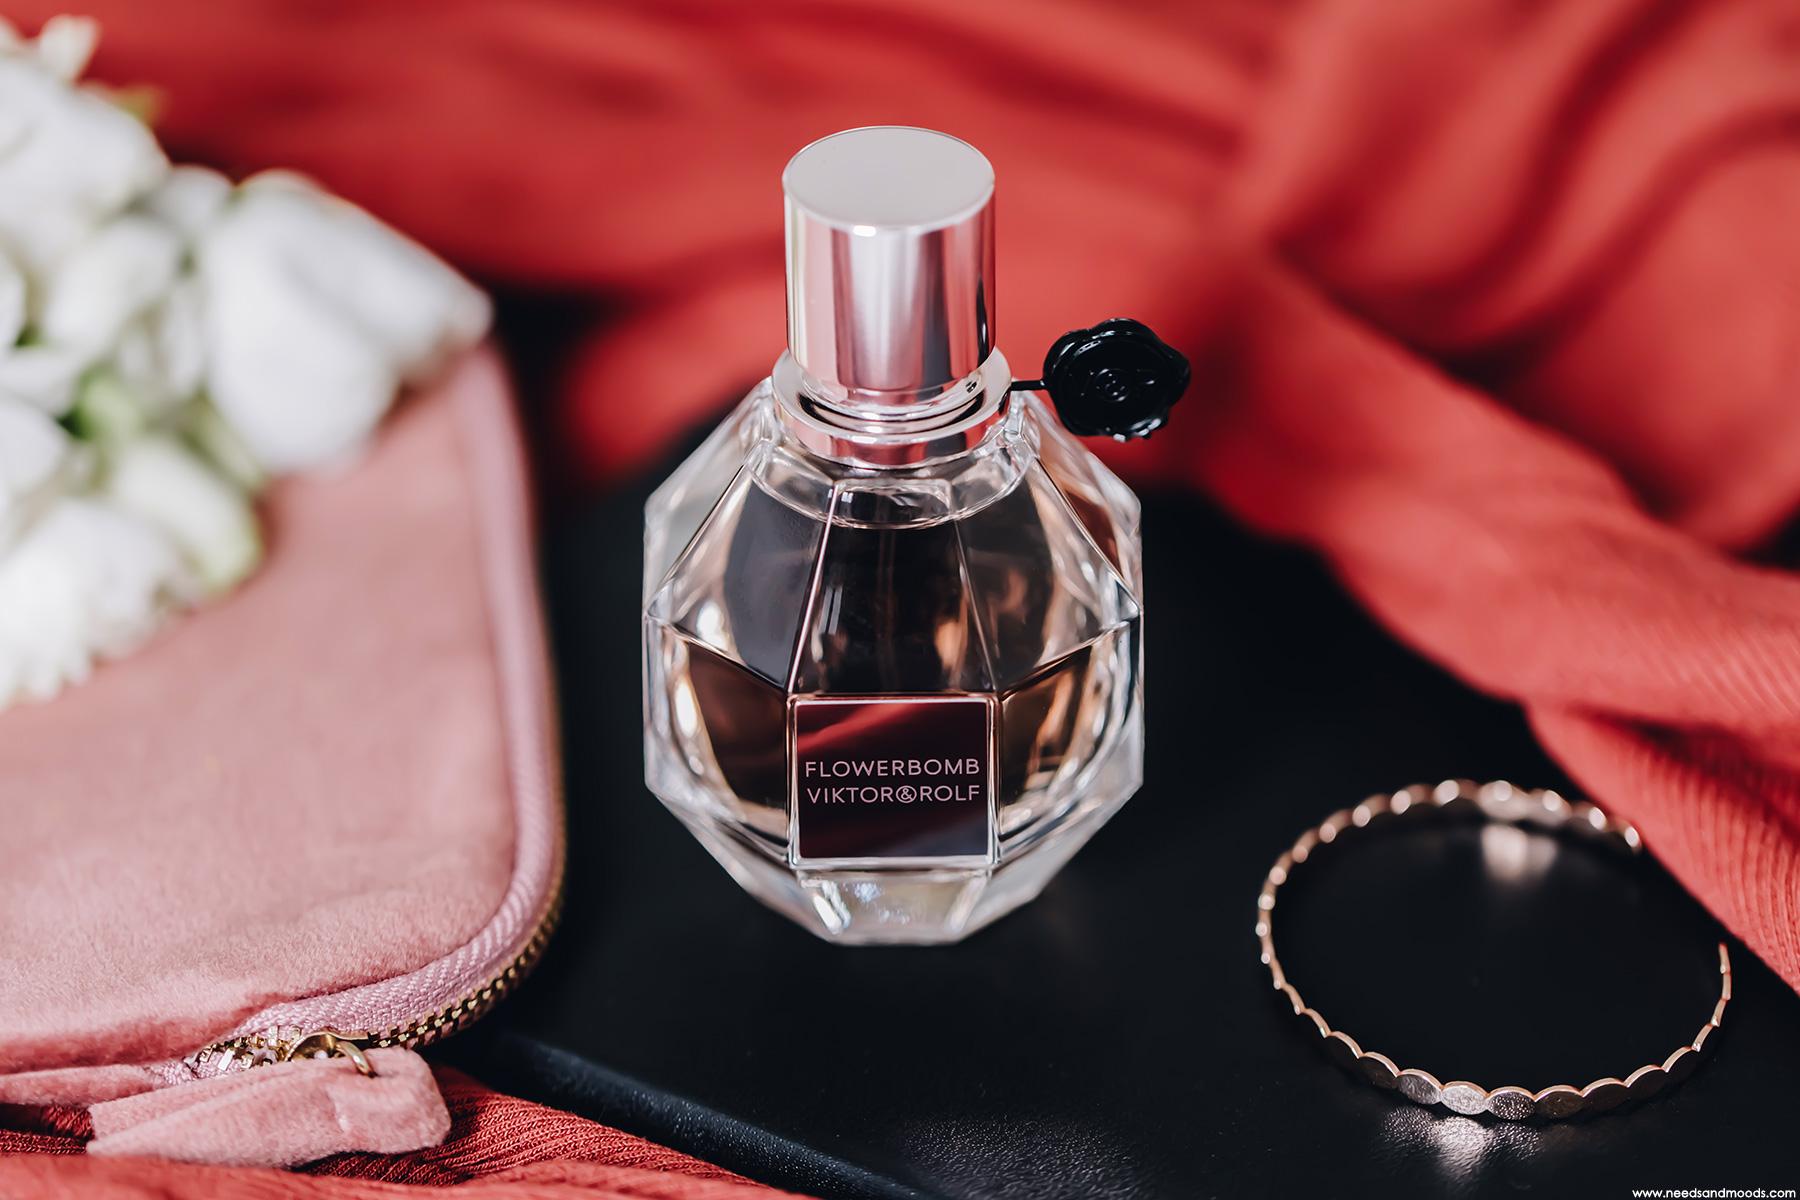 viktor rolf parfum flowerbomb